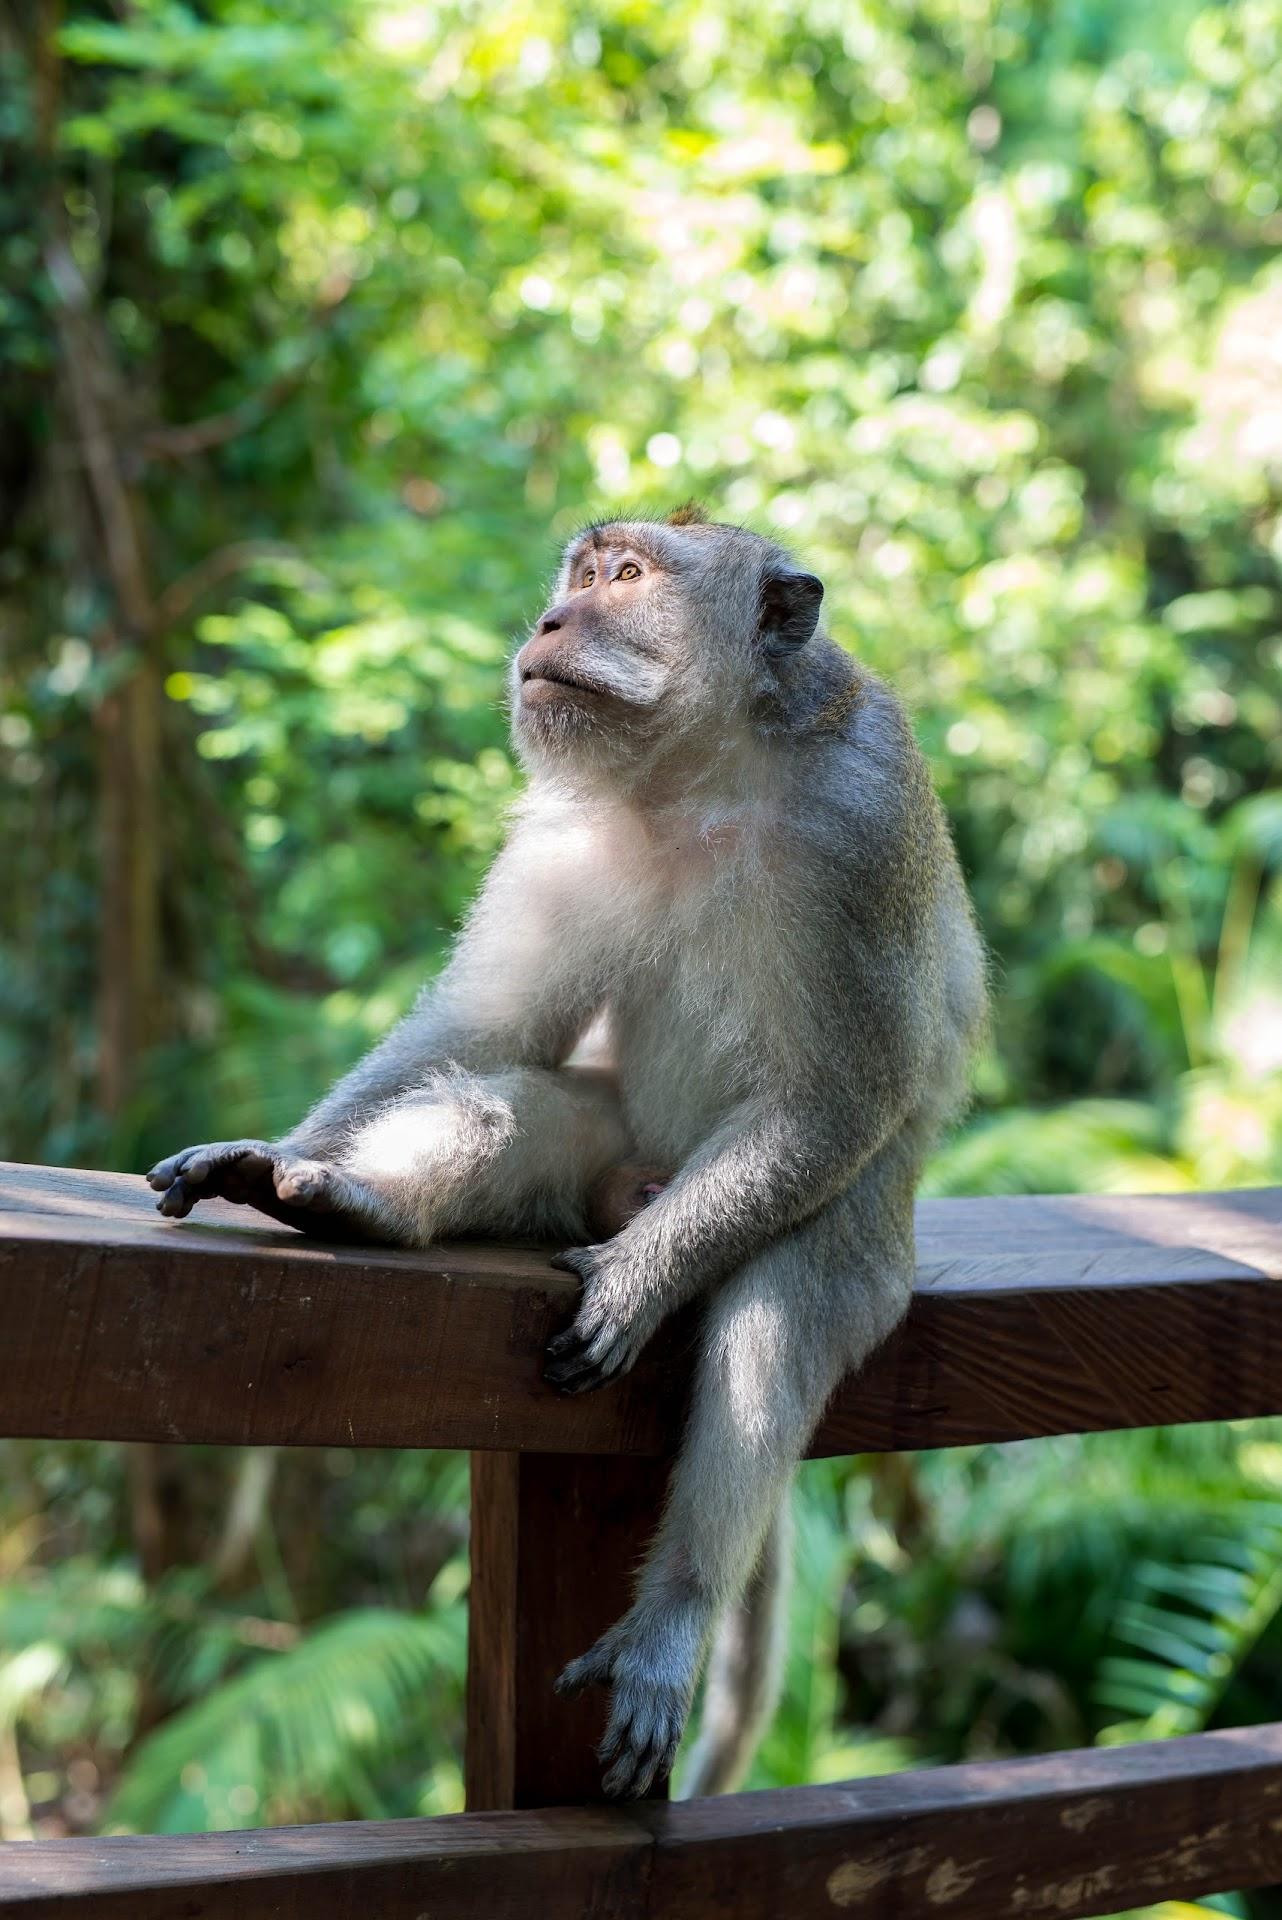 bali travel, travel blog, california san francisco bay area blogger, nature photographer, animals, monkey photography, bali ubud, monkey forest sanctuary, best things to do in bali